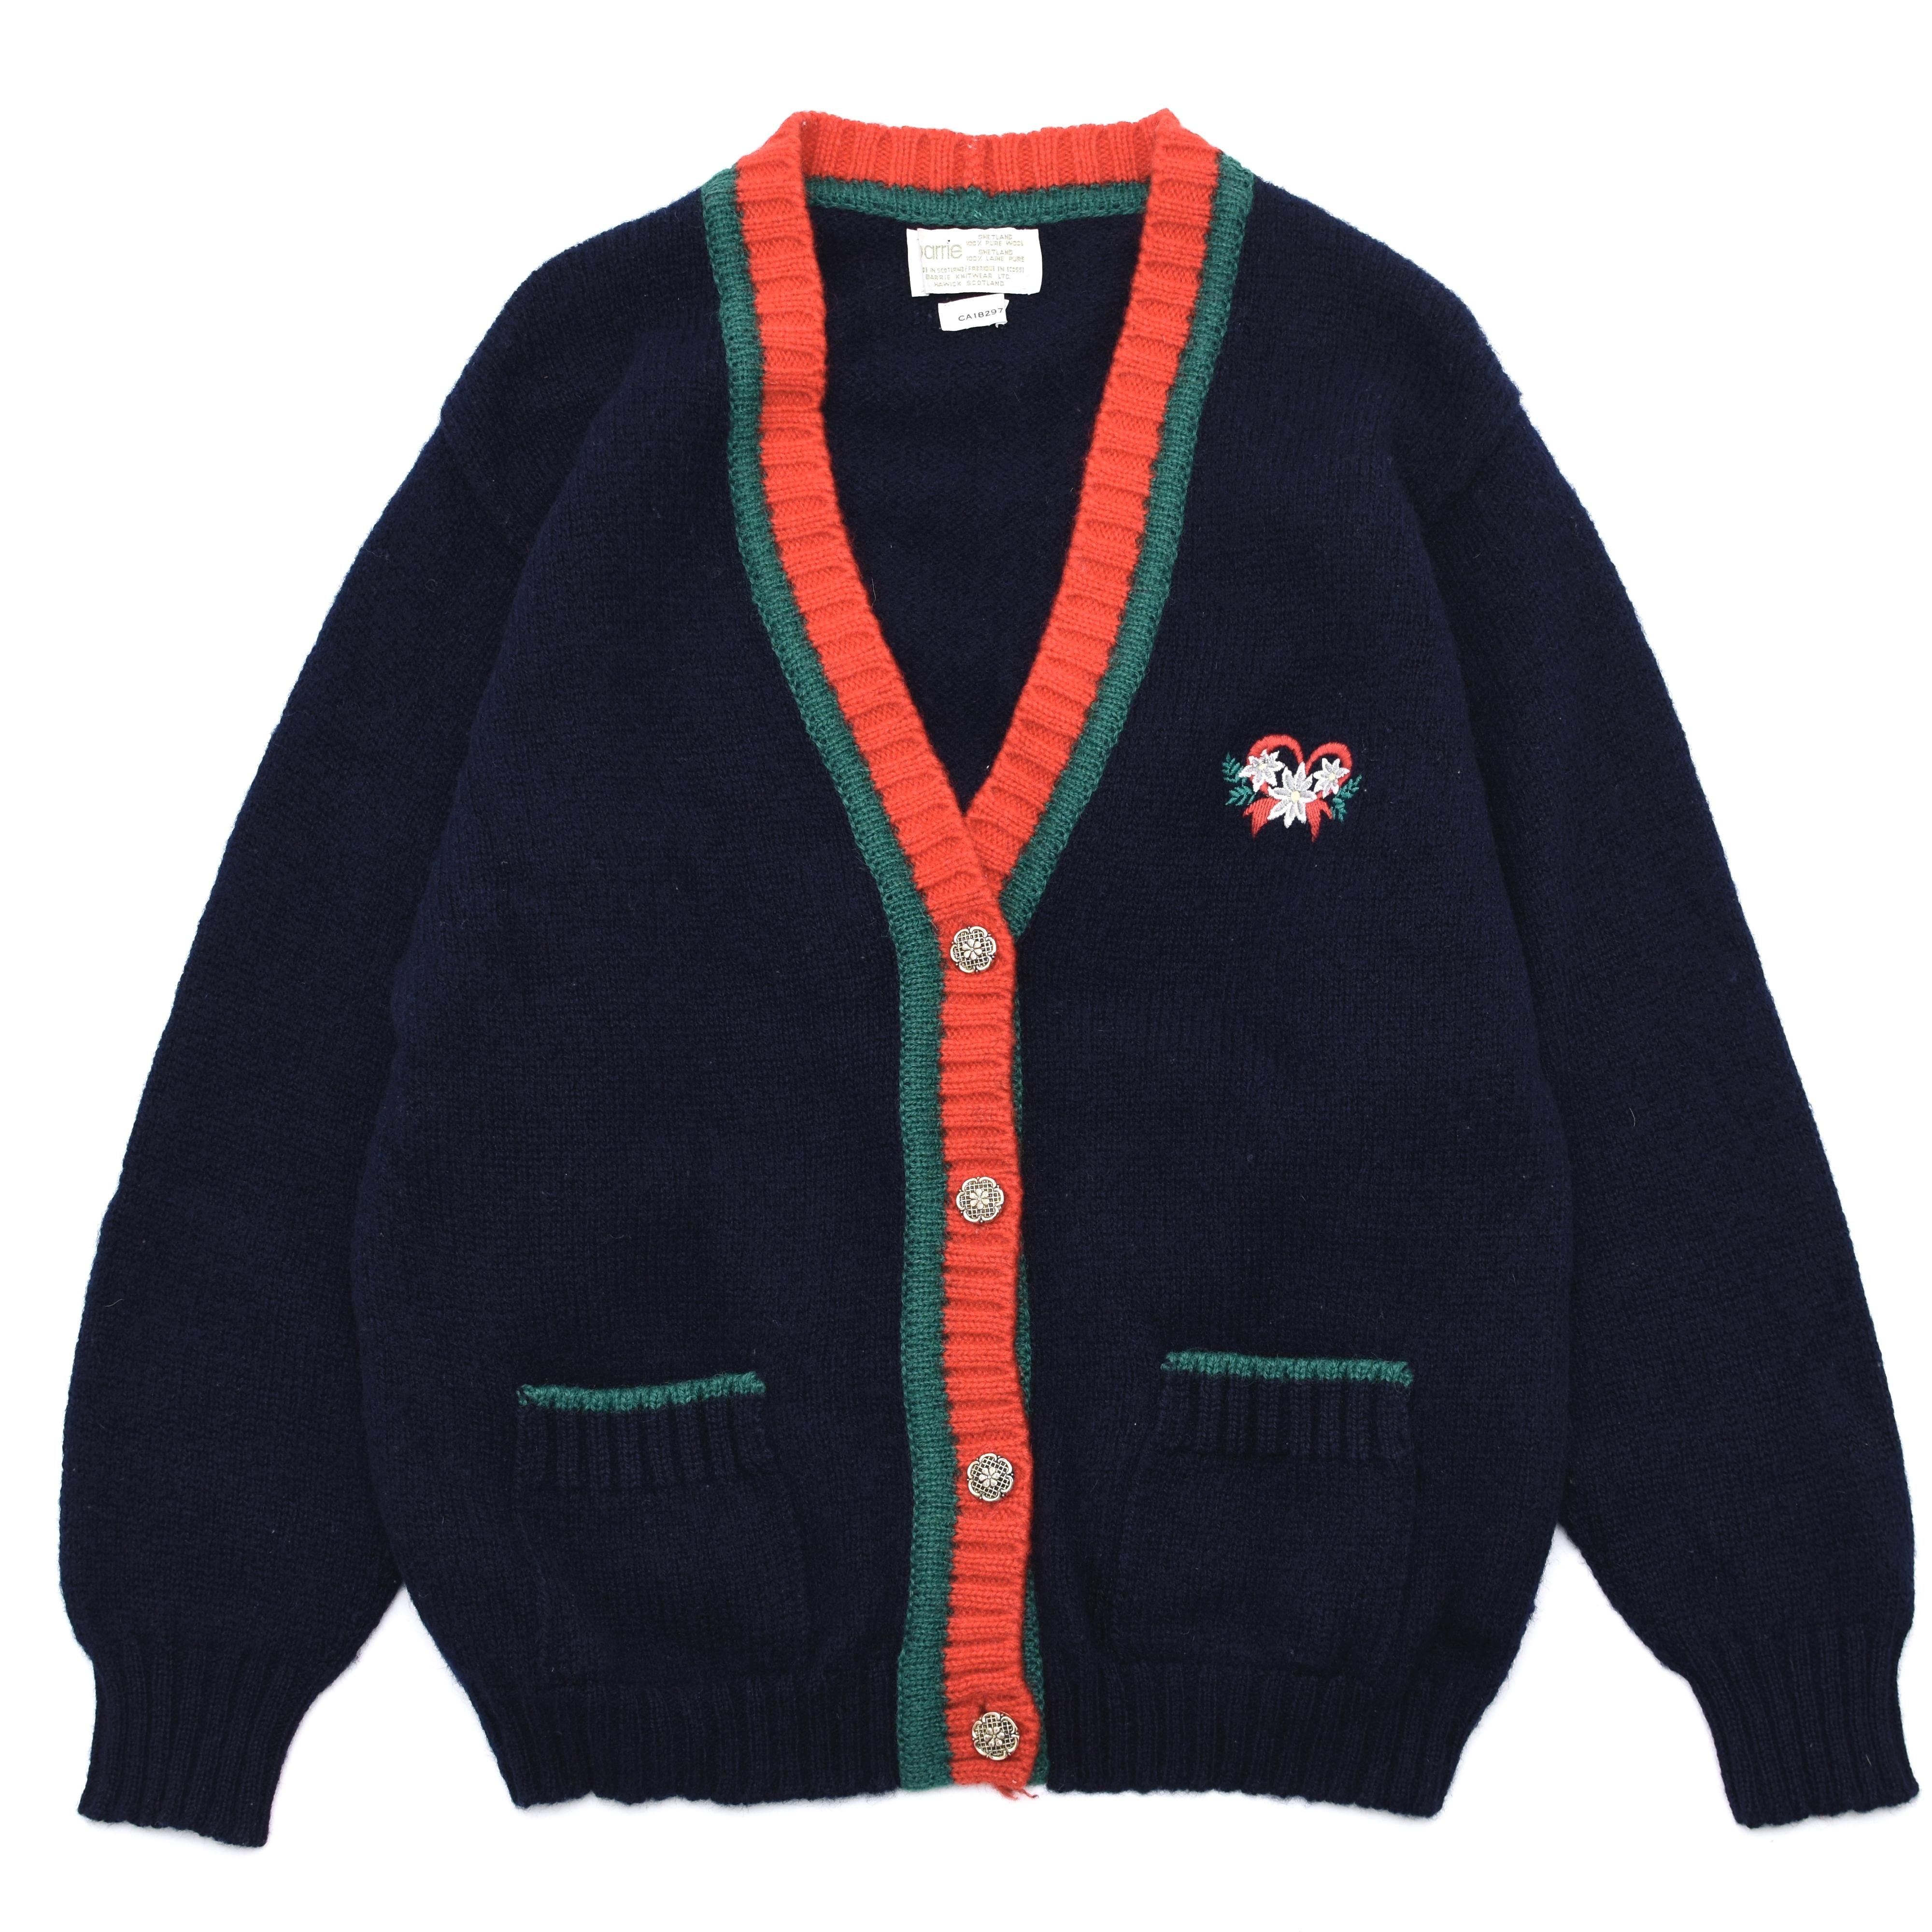 VTG flower embroidery wool knit cardigan